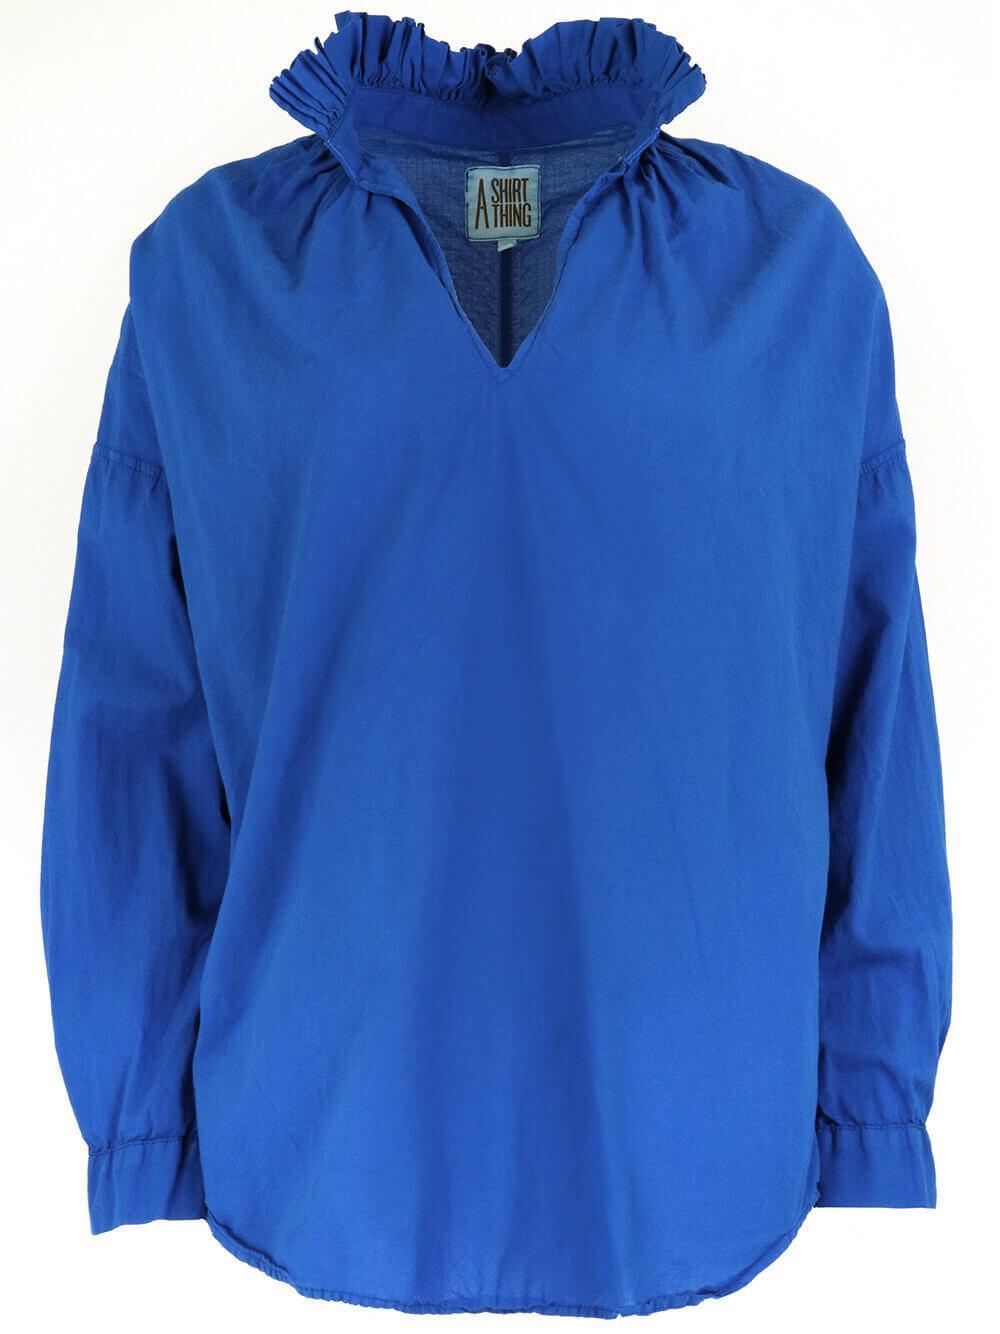 Penelope Cabo Shirt Item # 706-TP10188-SU21